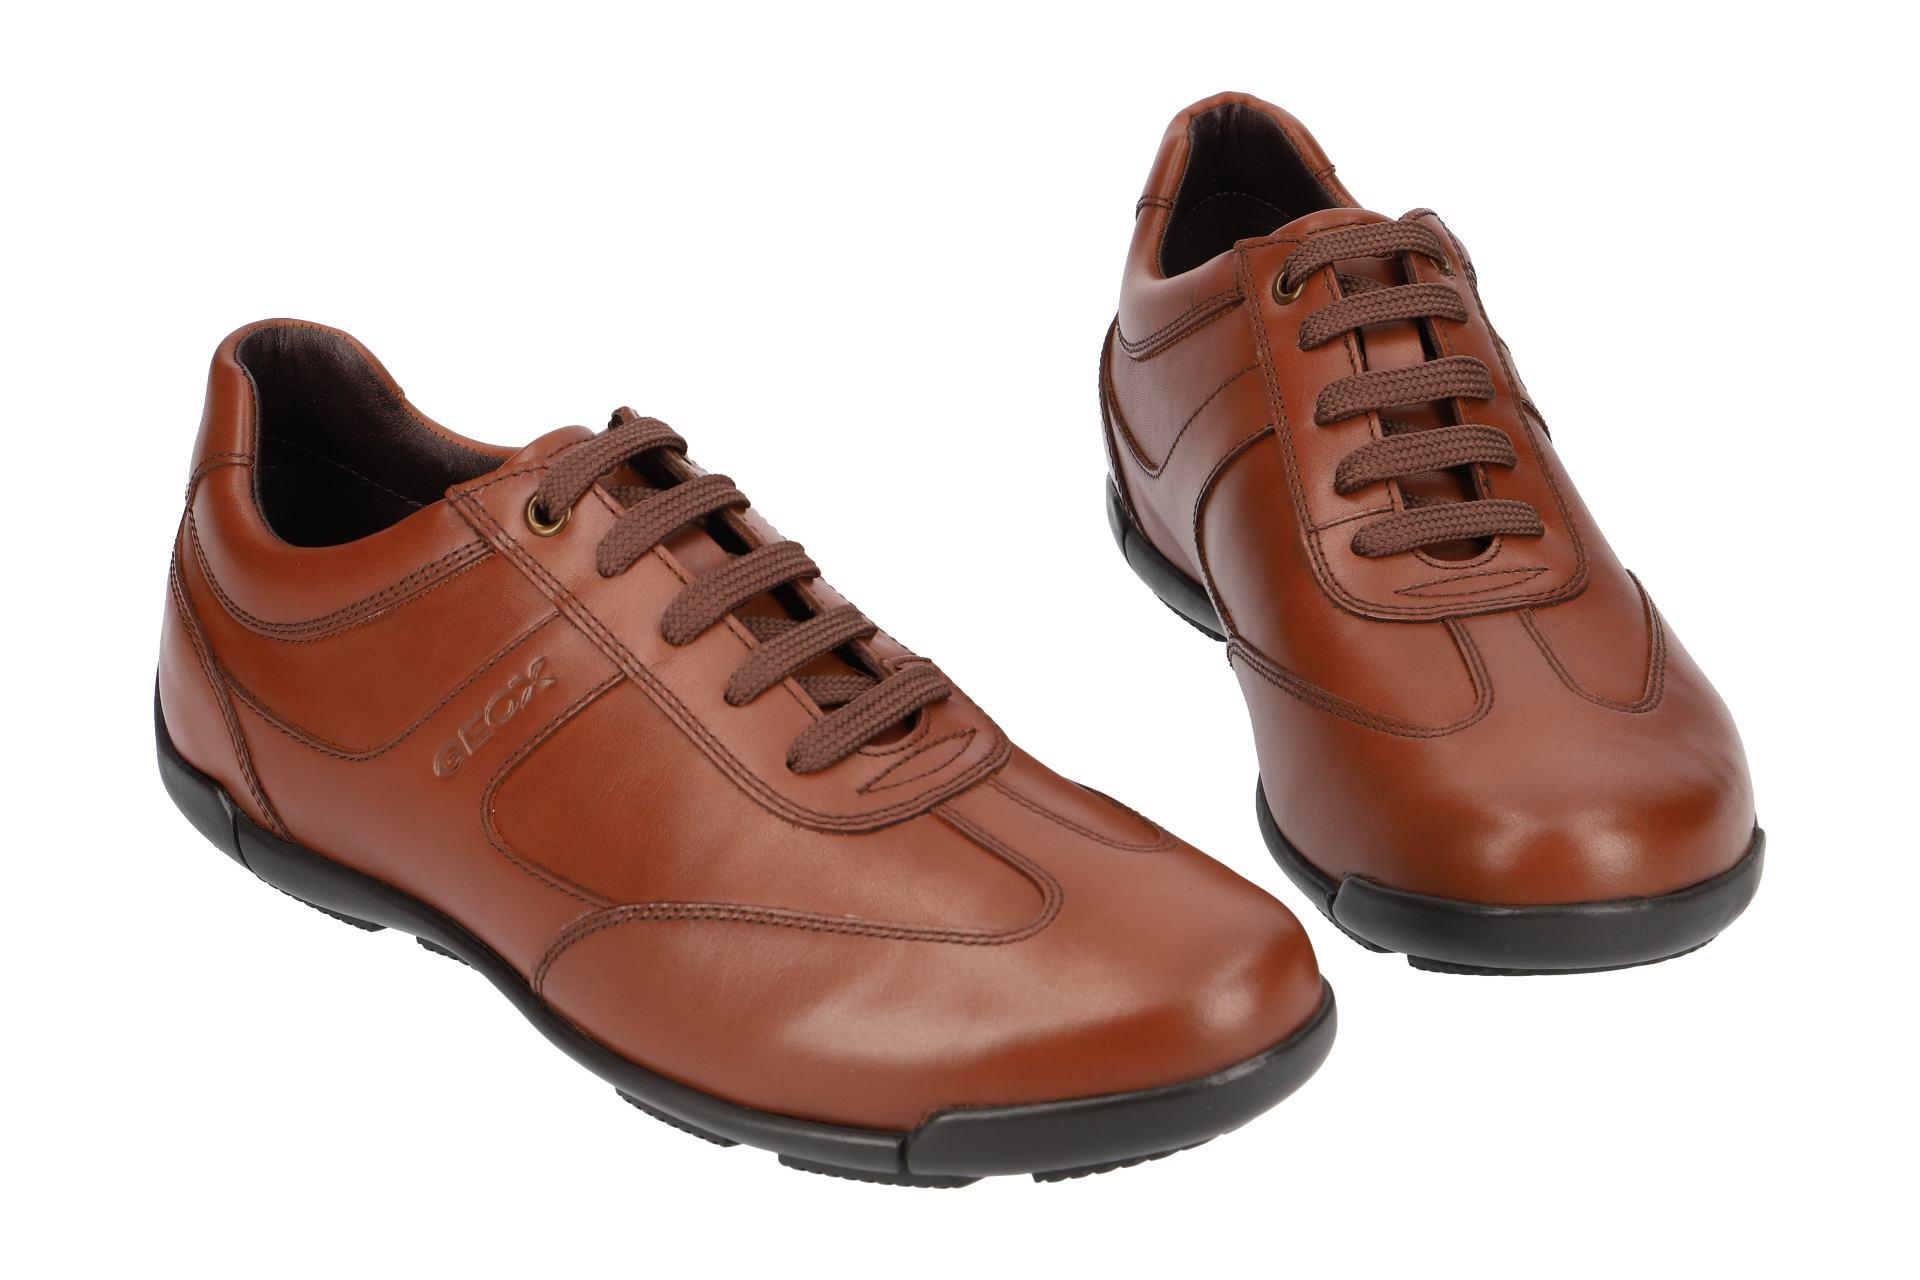 Schuhe Edgware Braun Sneakers C6001 U743bb Geox 043bc Herrenschuhe SMzVqUGp